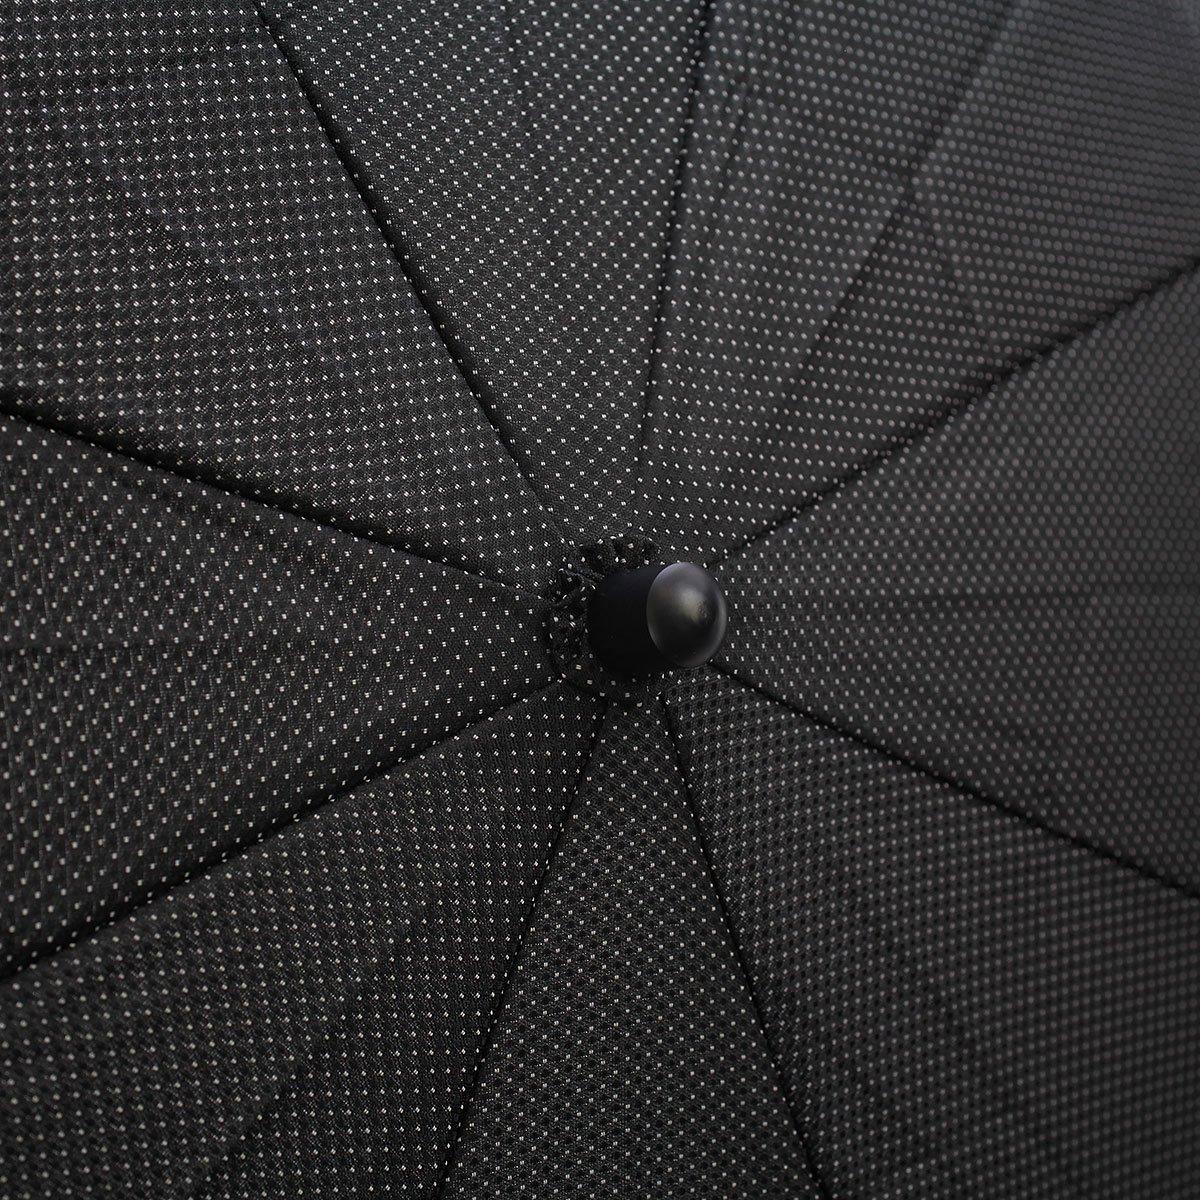 NEW ピンドット 折りたたみ傘 詳細画像7